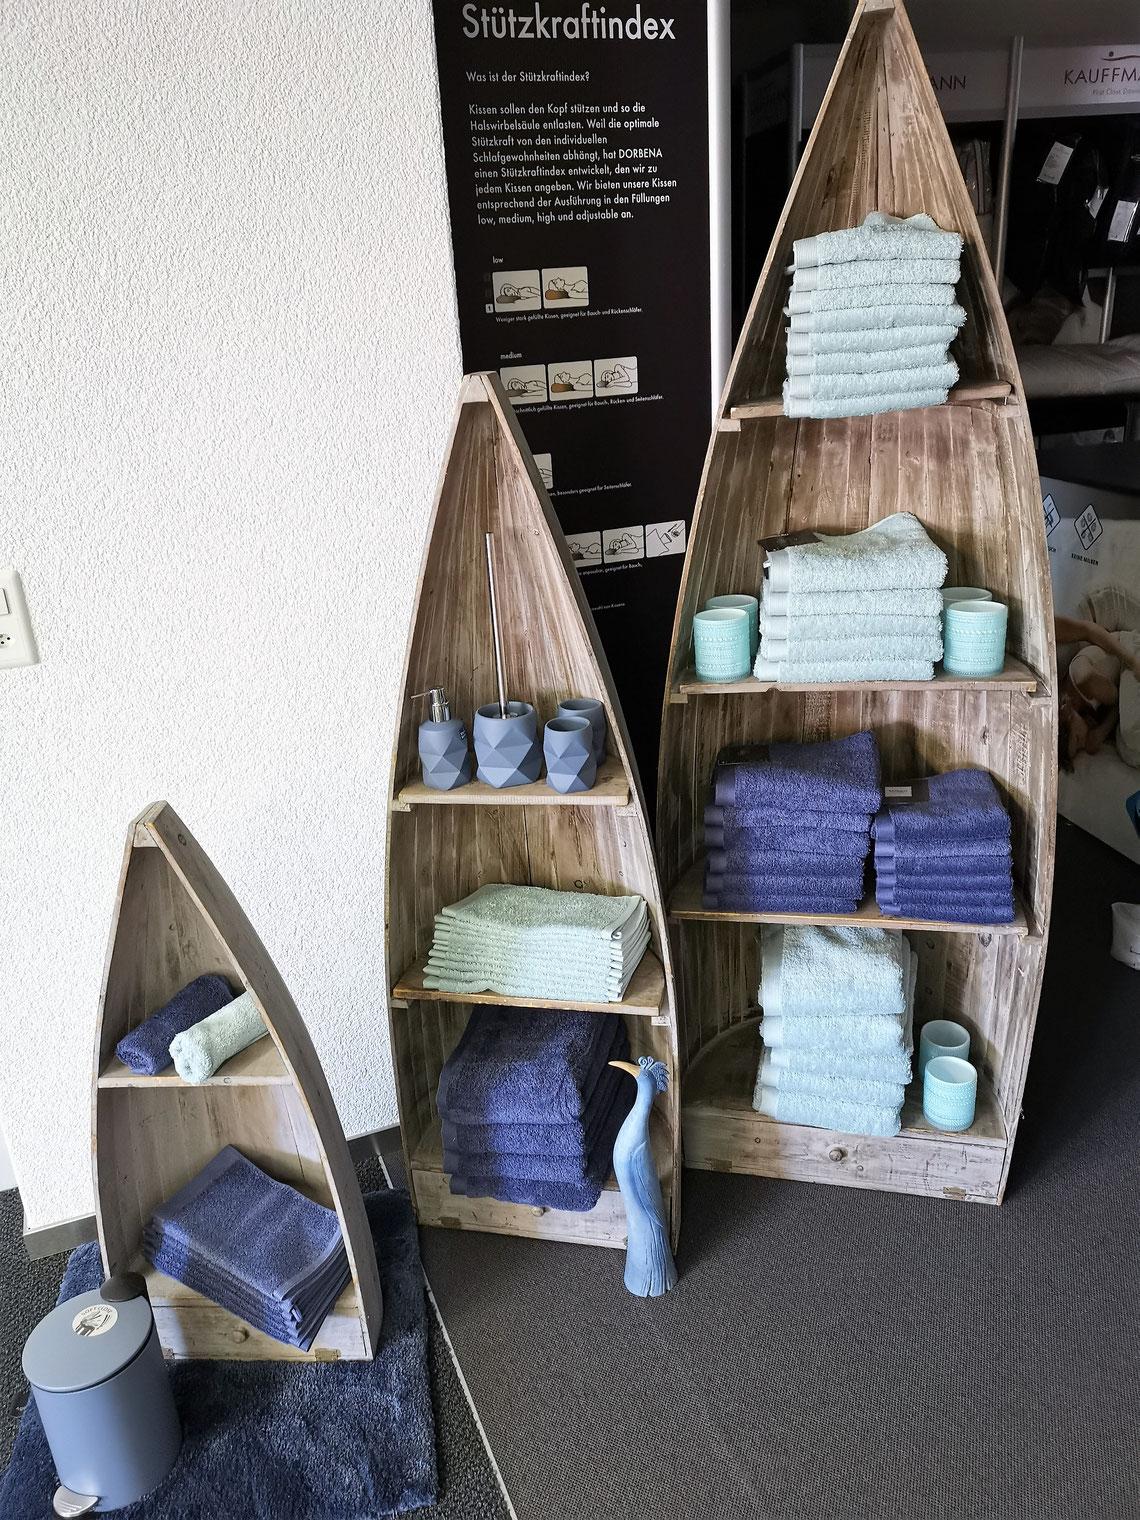 Frottierwäsche, Heimtextilien, Robertruoss, Badzimmer, Badezimmerartikel